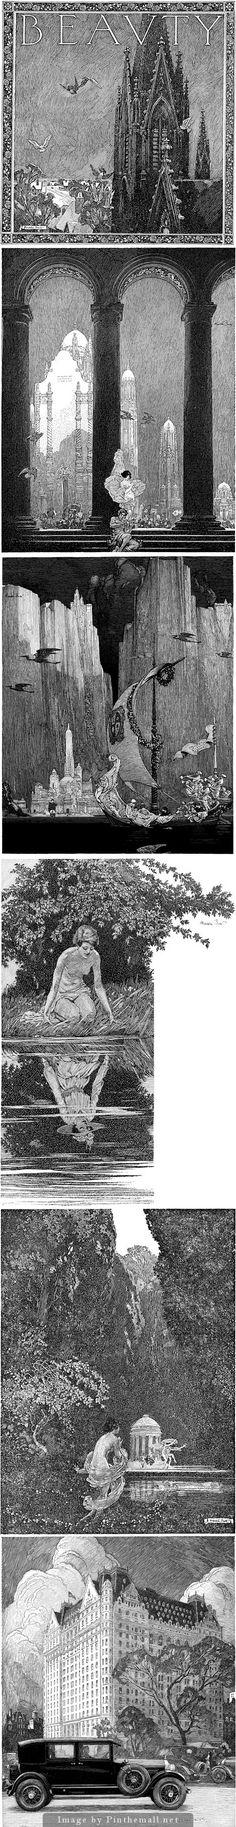 Franklin Booth  http://www.fuelyourillustration.com/5-great-draftsmen-franklin-booth/